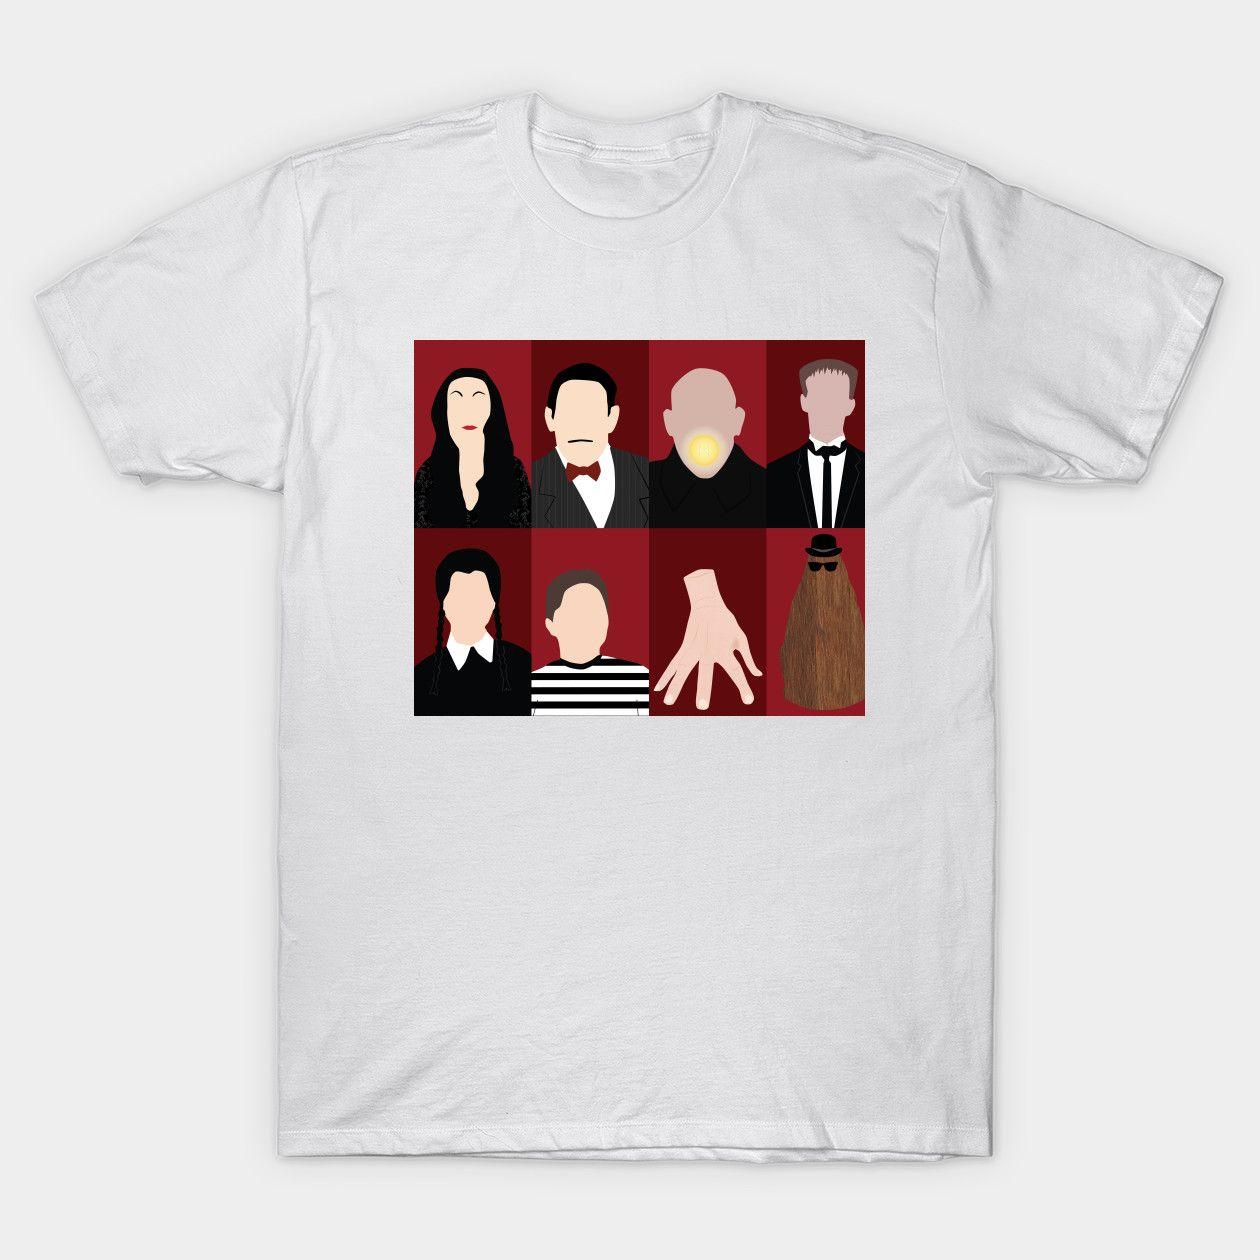 Addams Family Addams Family Classic T Shirt Classic T Shirts Family Shirts T Shirt